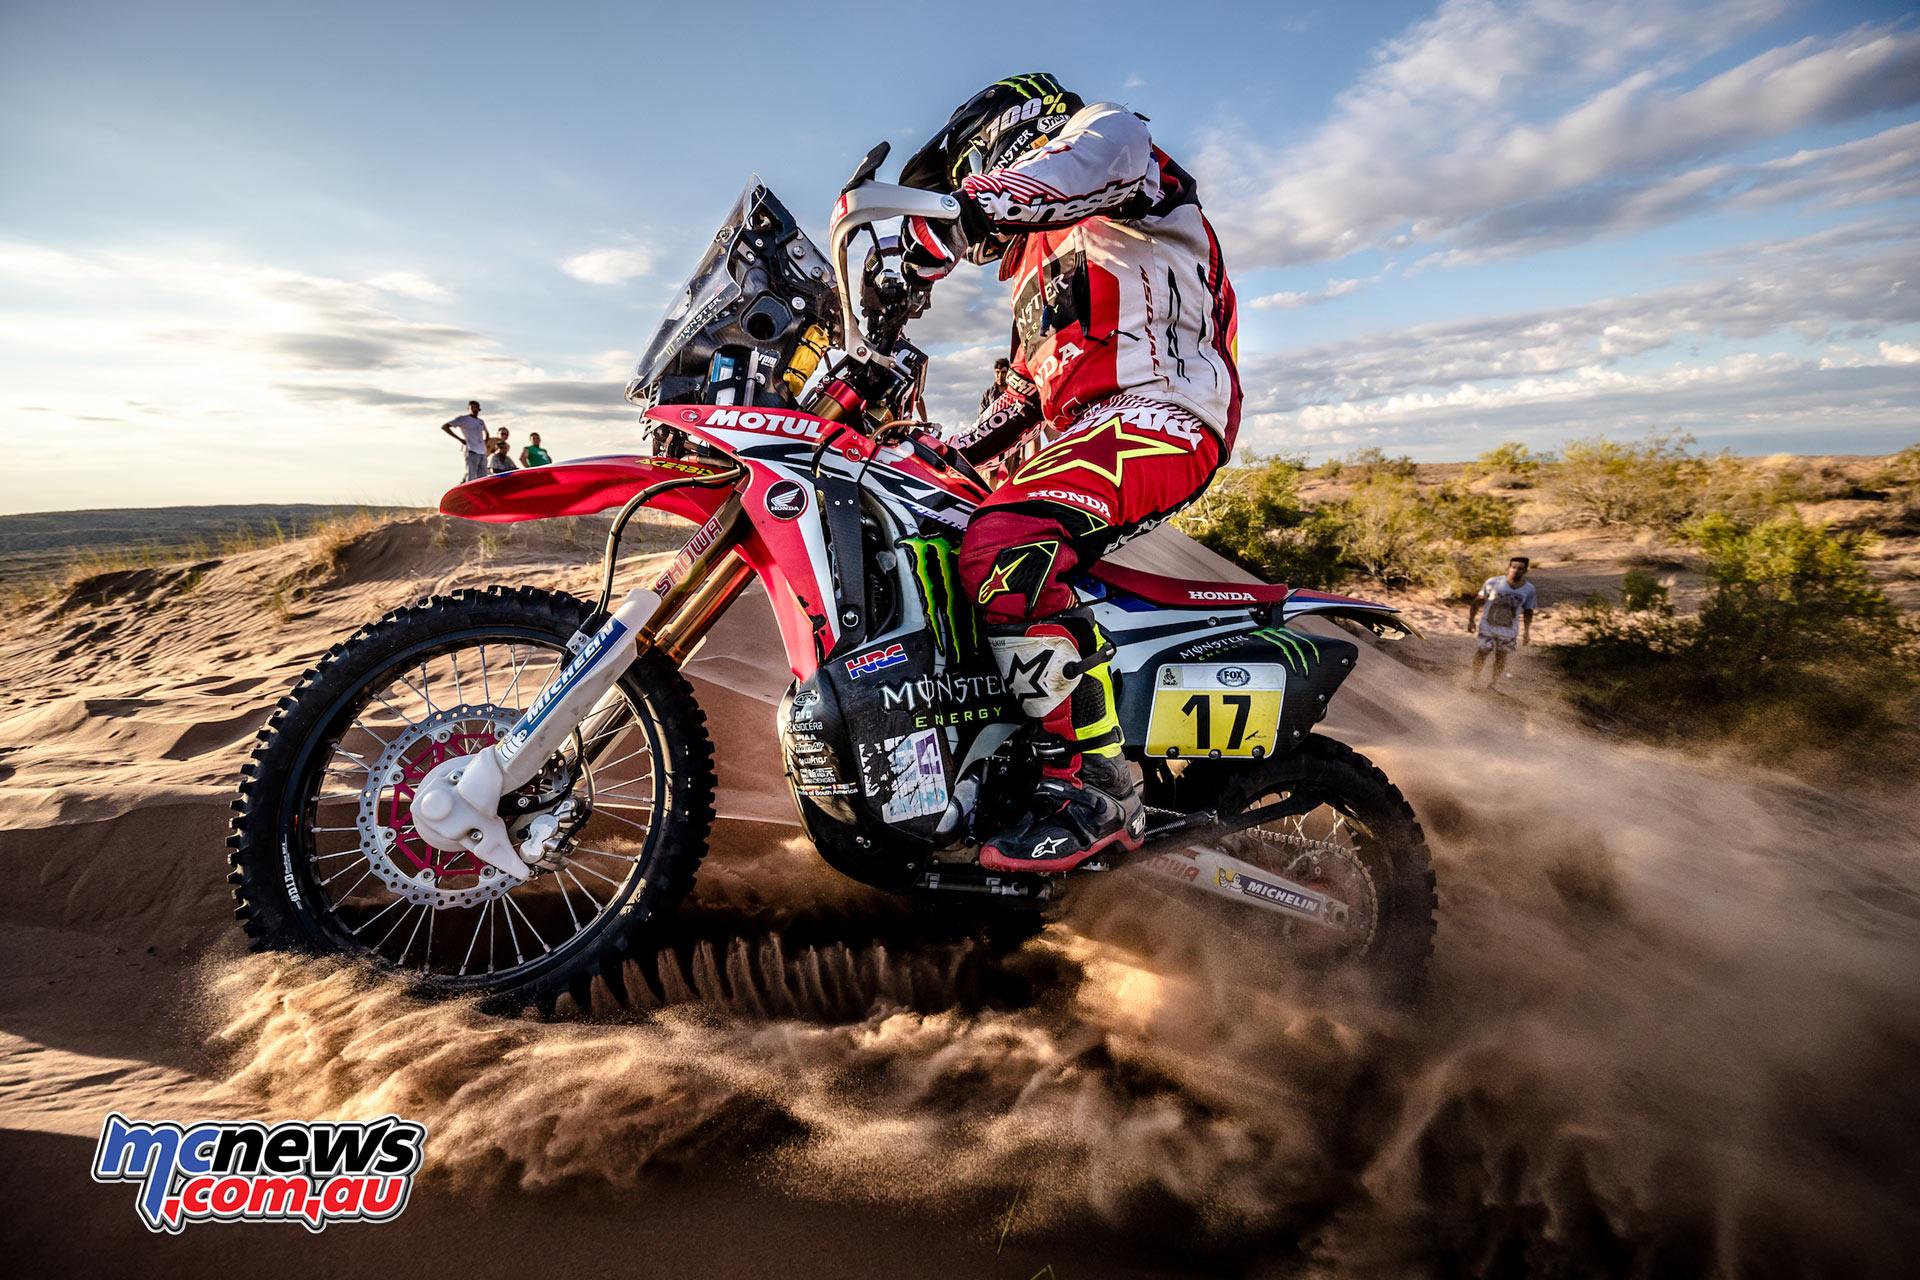 2017 Dakar Rally - Paulo Goncalves